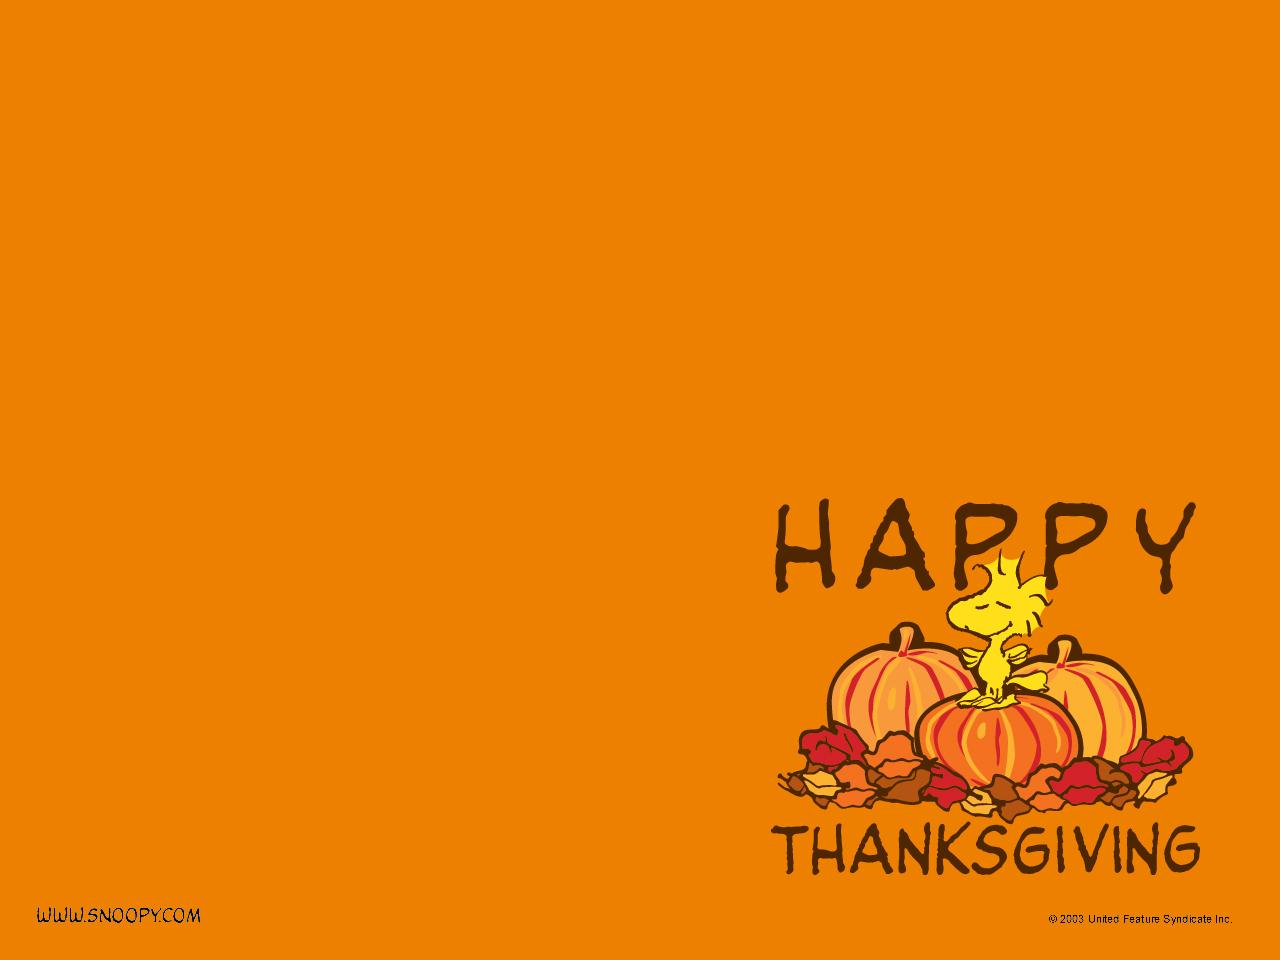 Peanuts Thanksgiving Desktop Backgrounds Images amp Pictures 1280x960